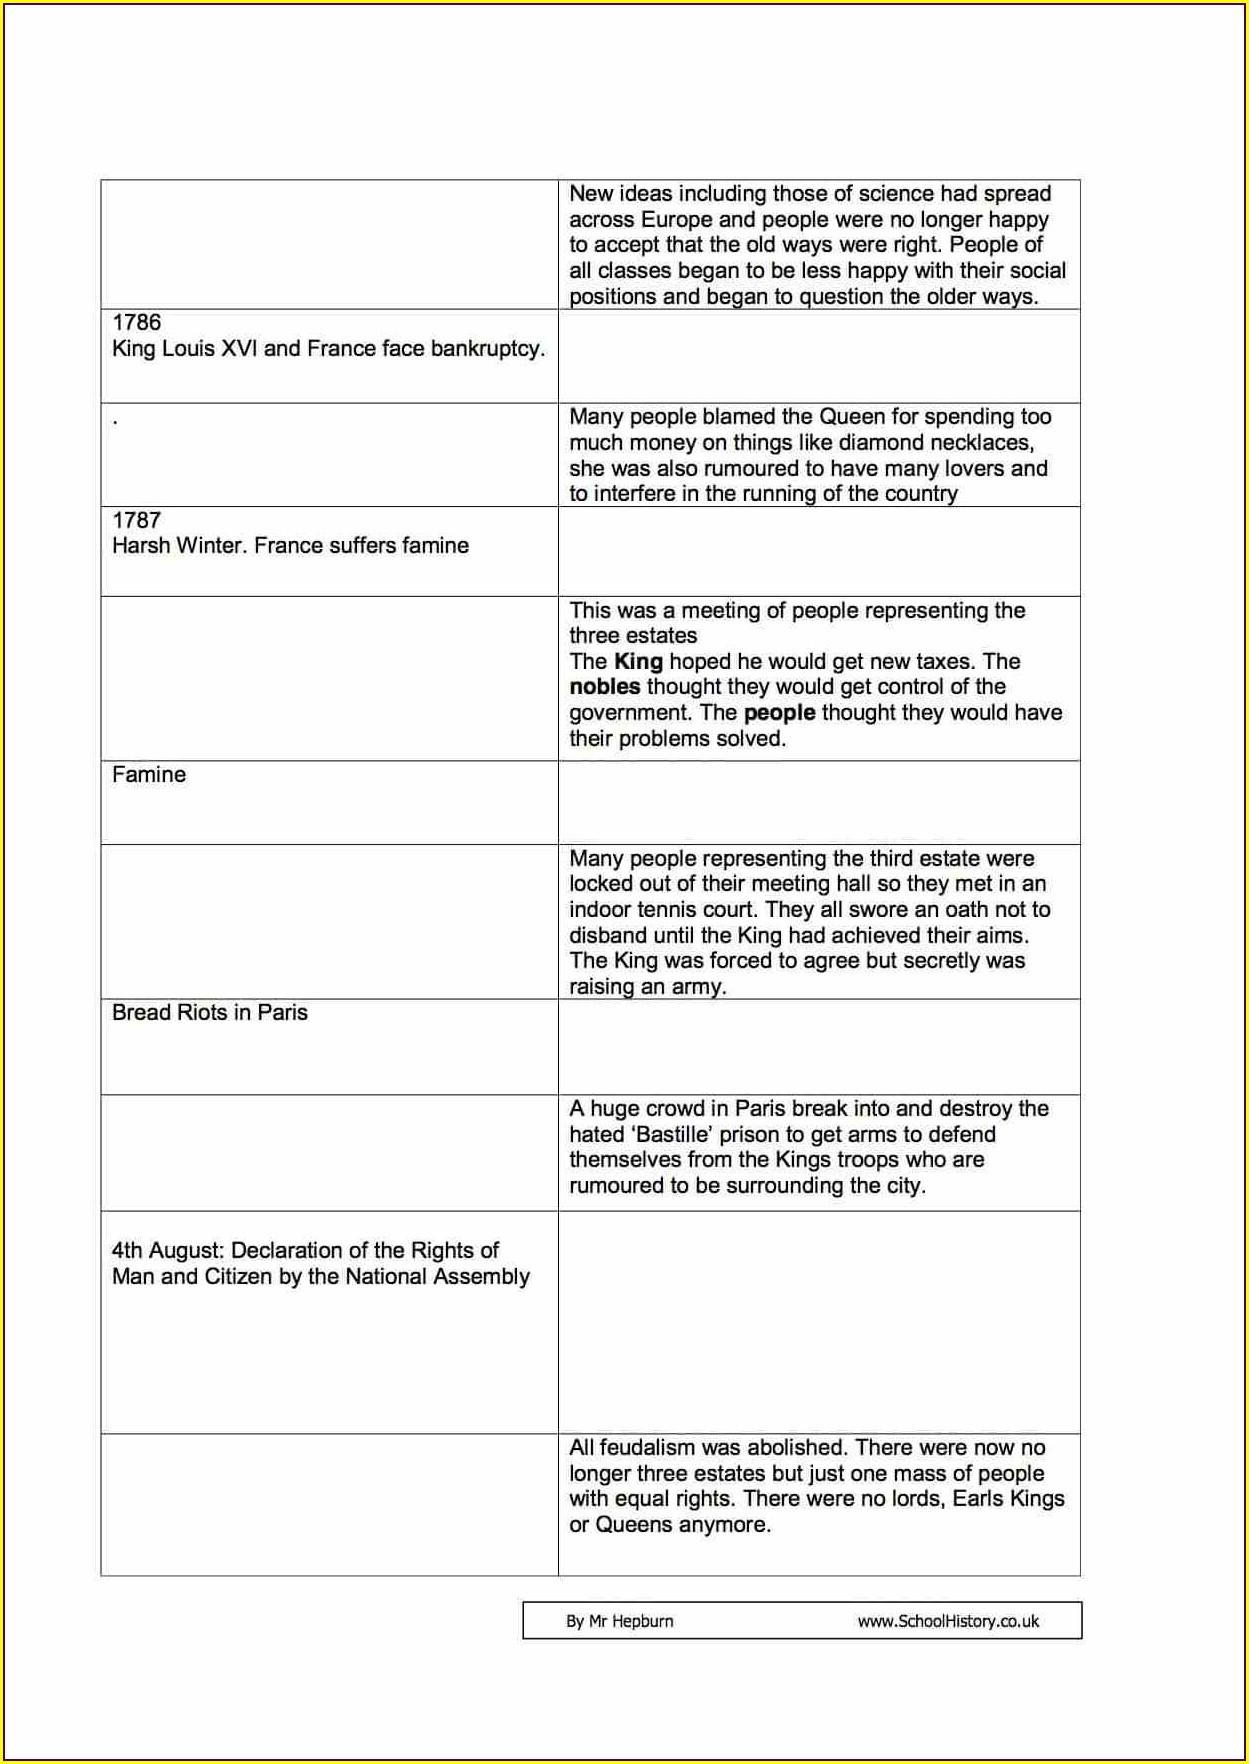 French Revolution Timeline Worksheet